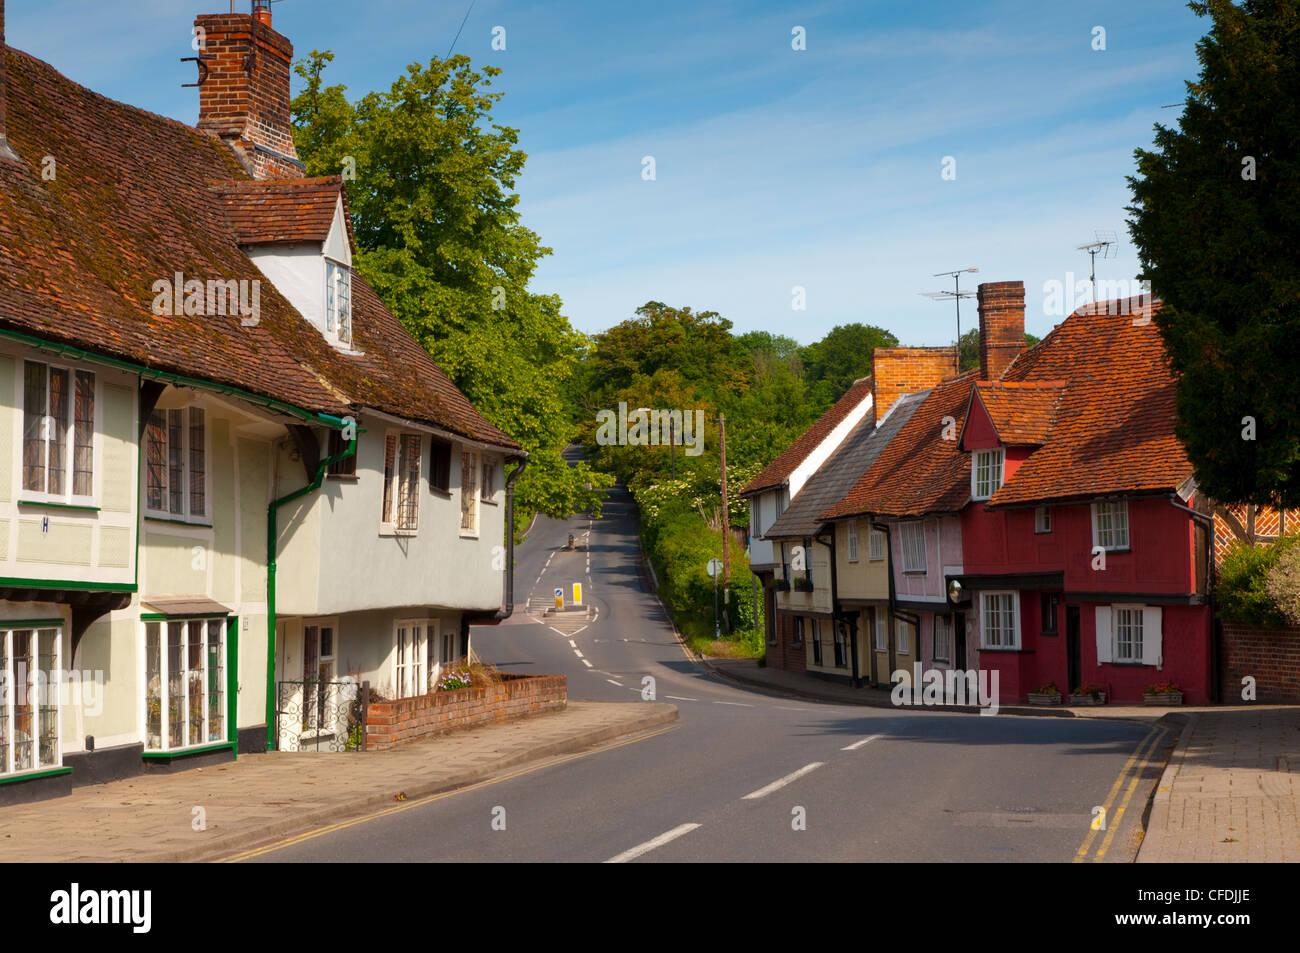 Saffron Walden, Essex, England, United Kingdom, Europe - Stock Image